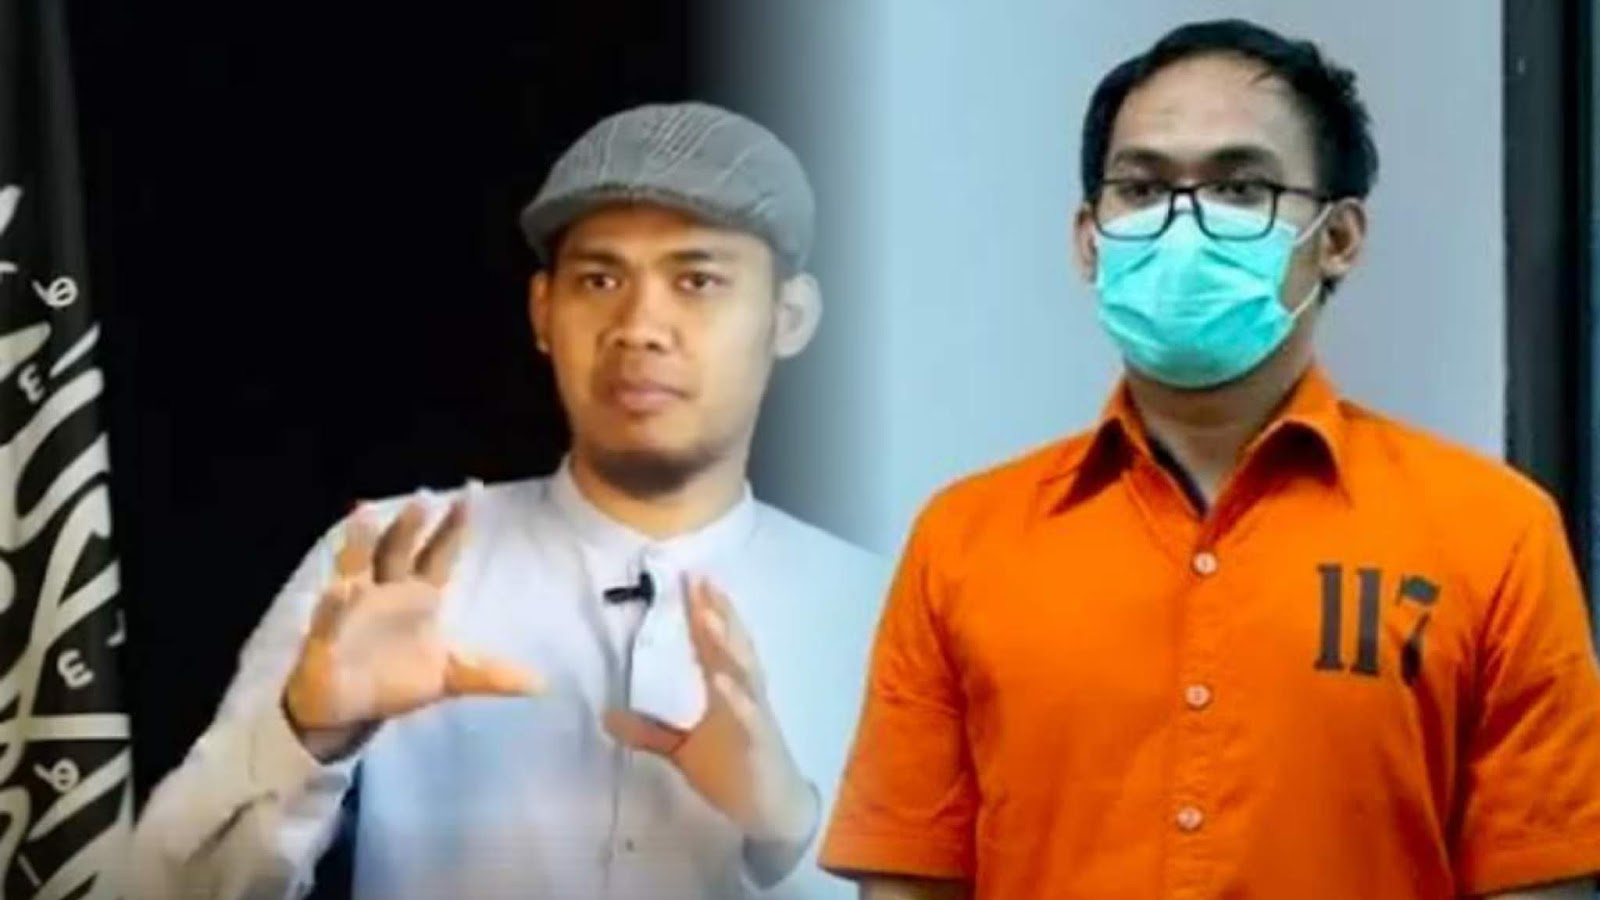 Bareskrim Dituding Lakukan Kekerasan Terhadap Ali Tersangka Penghina Jokowi